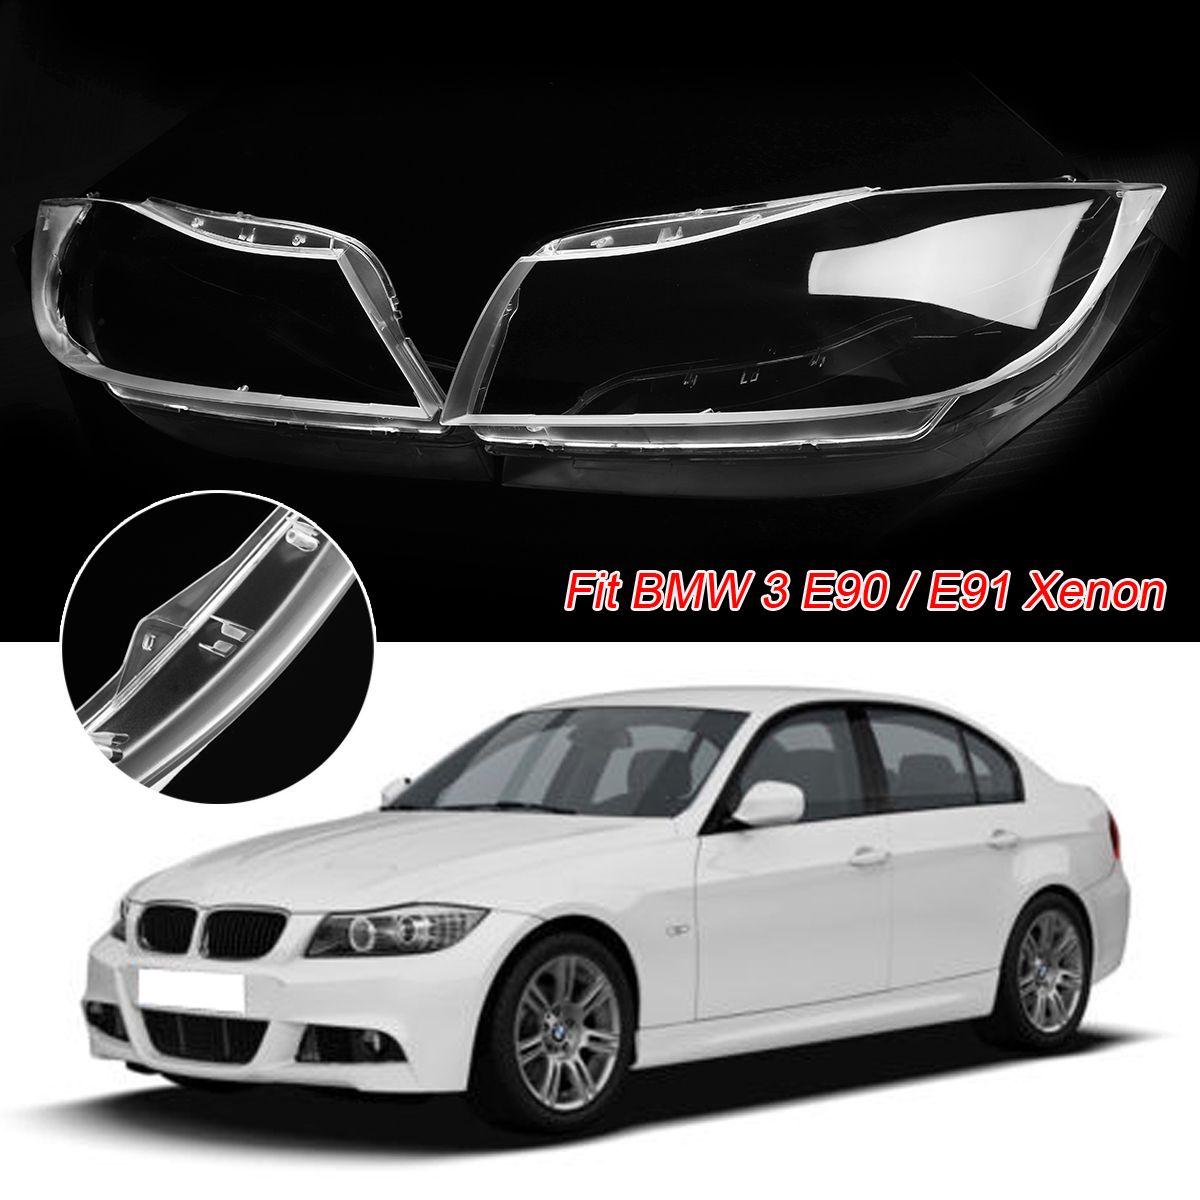 2pcs Headlight Lens Plastic Cover For BMW 3 E90 Sedan/E91 Touring Only For XENON Clear Headlight Headlamp Lens Covers In Shell